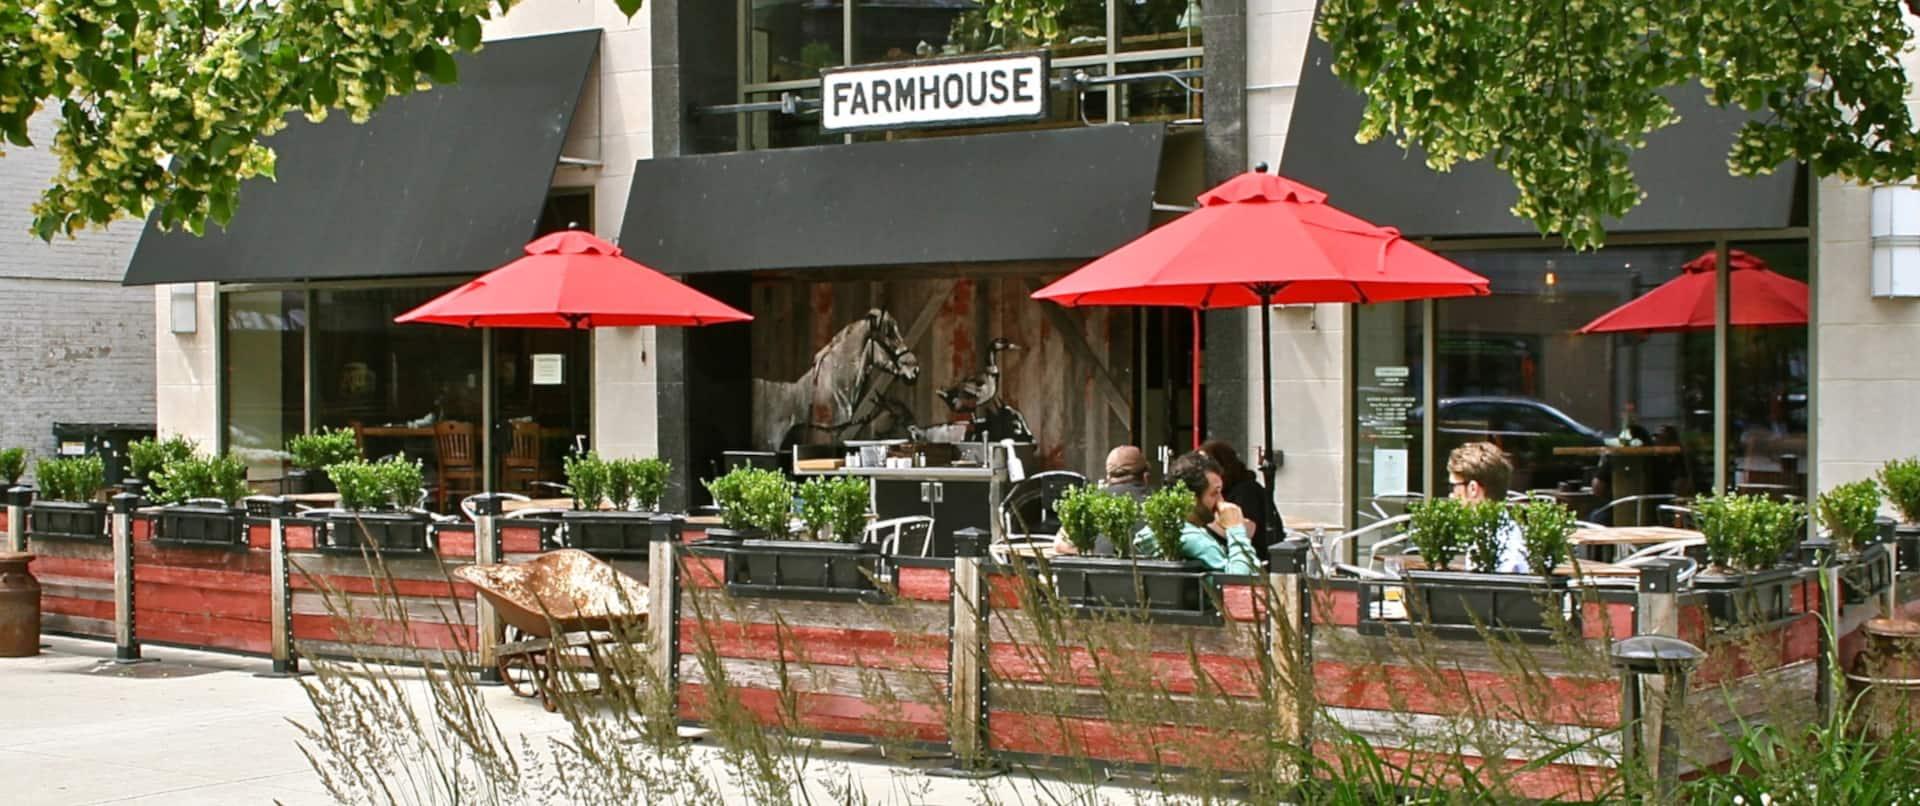 Farmhouse Restaurant with Outdoor Patio